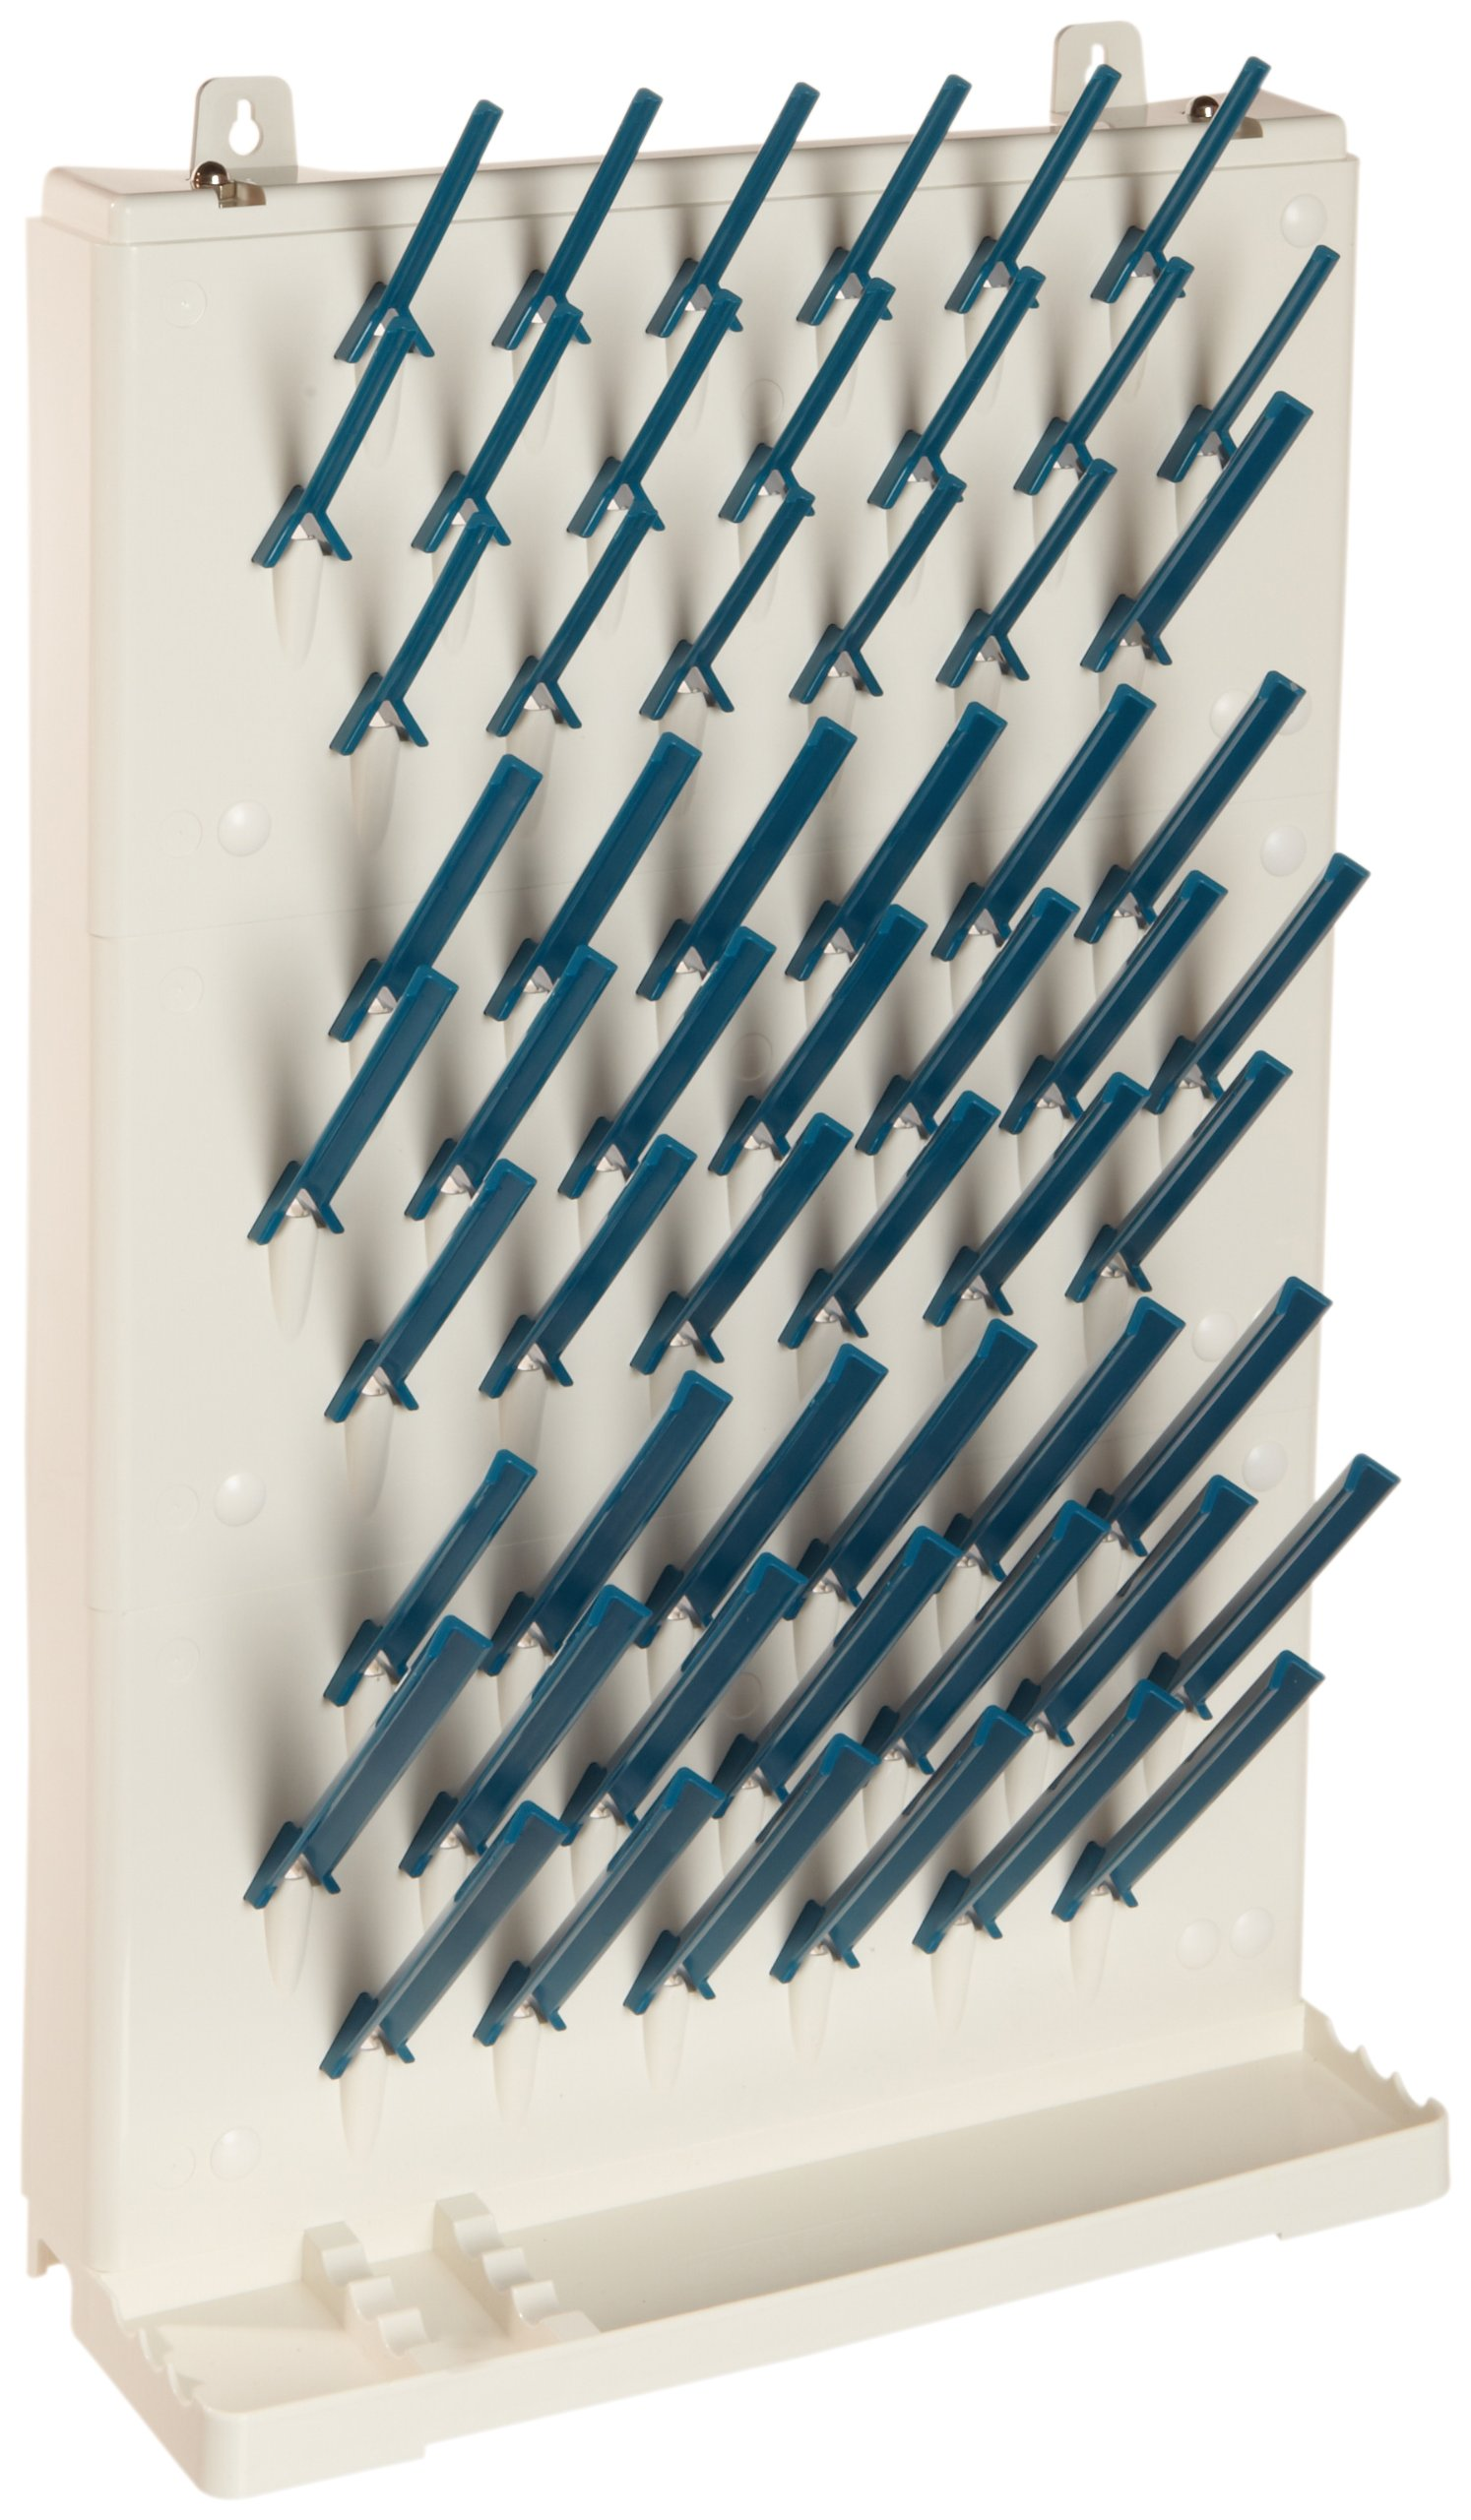 Bel-Art Lab-Aire II Single-Sided Non-Electric Wallmount Glassware Dryer; 3 Tier, 14.75 x 5 x 23.4 in. (F18933-0013)